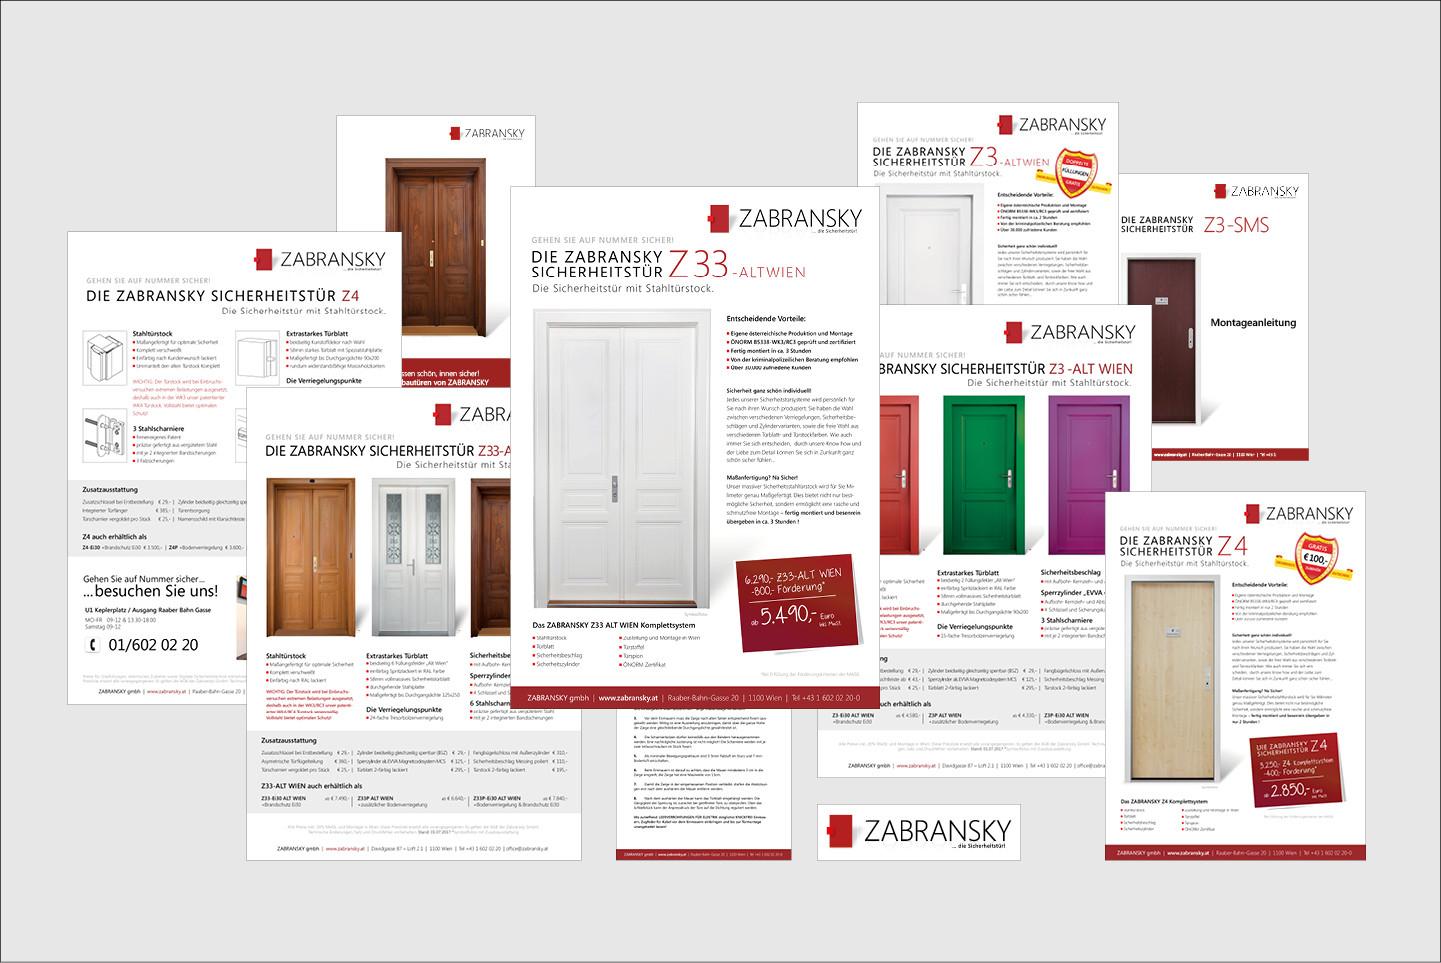 ZABRANSK GmbH Grafik diverse Drucksorten,  Fotografie,  HQ Bildretusche